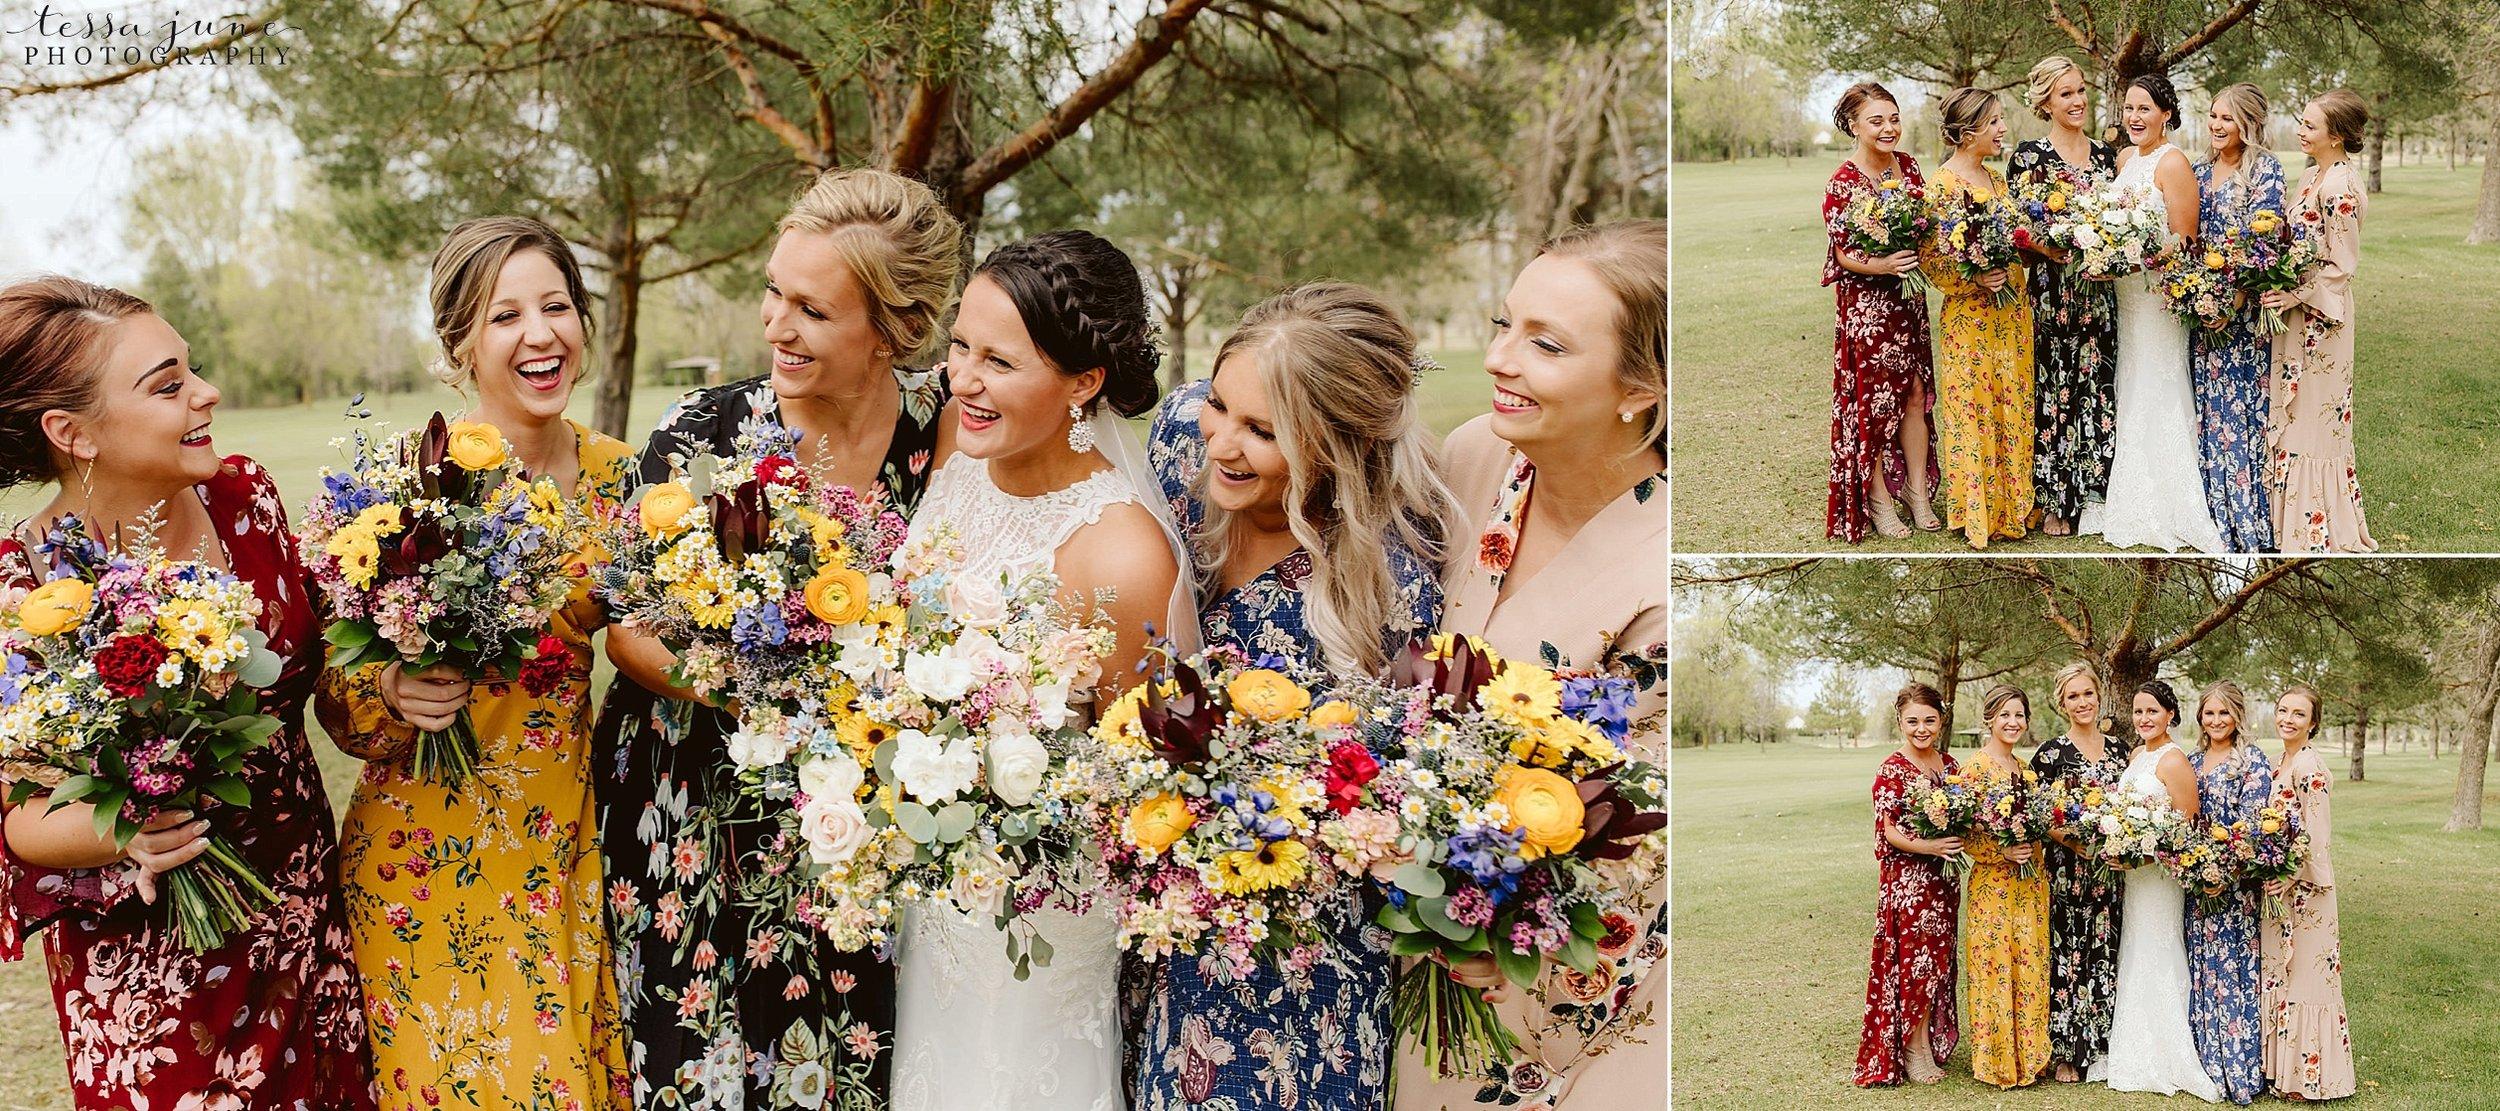 The-grands-at-mulligans-wedding-sartell-minnesota-spring-floral-spring-garden-wedding-75.jpg